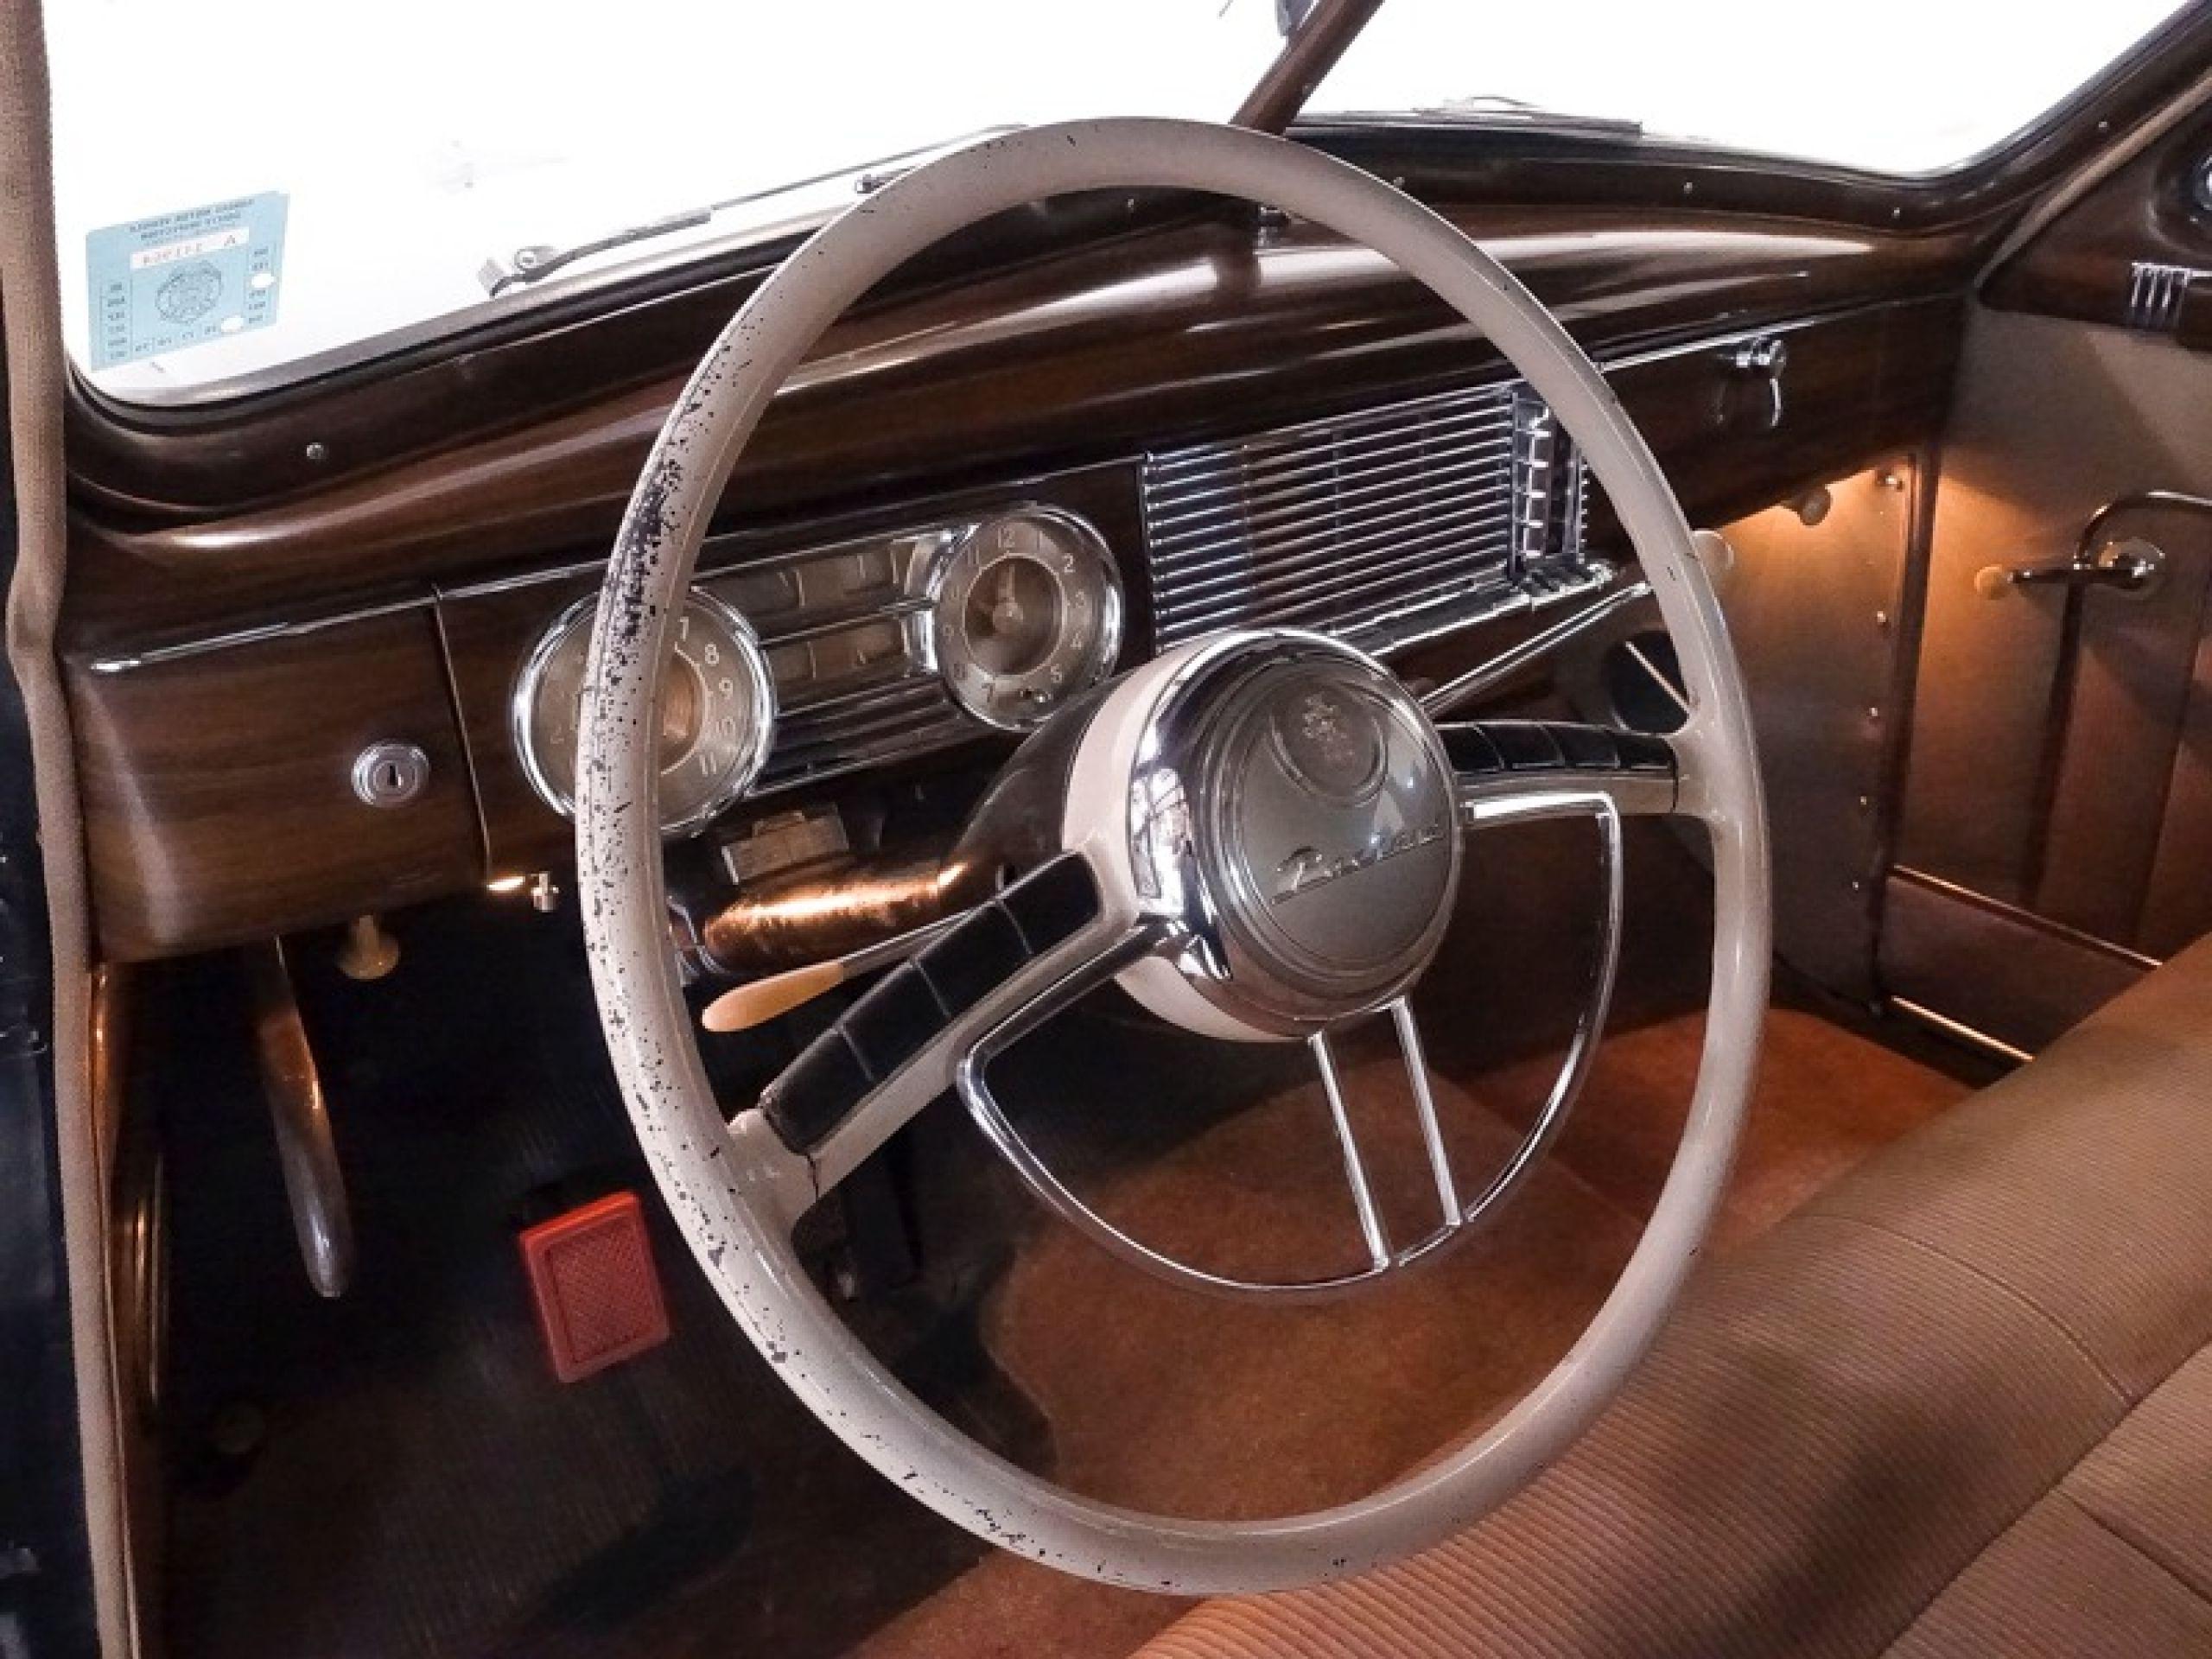 1949 Packard Super Eight Touring Sedan